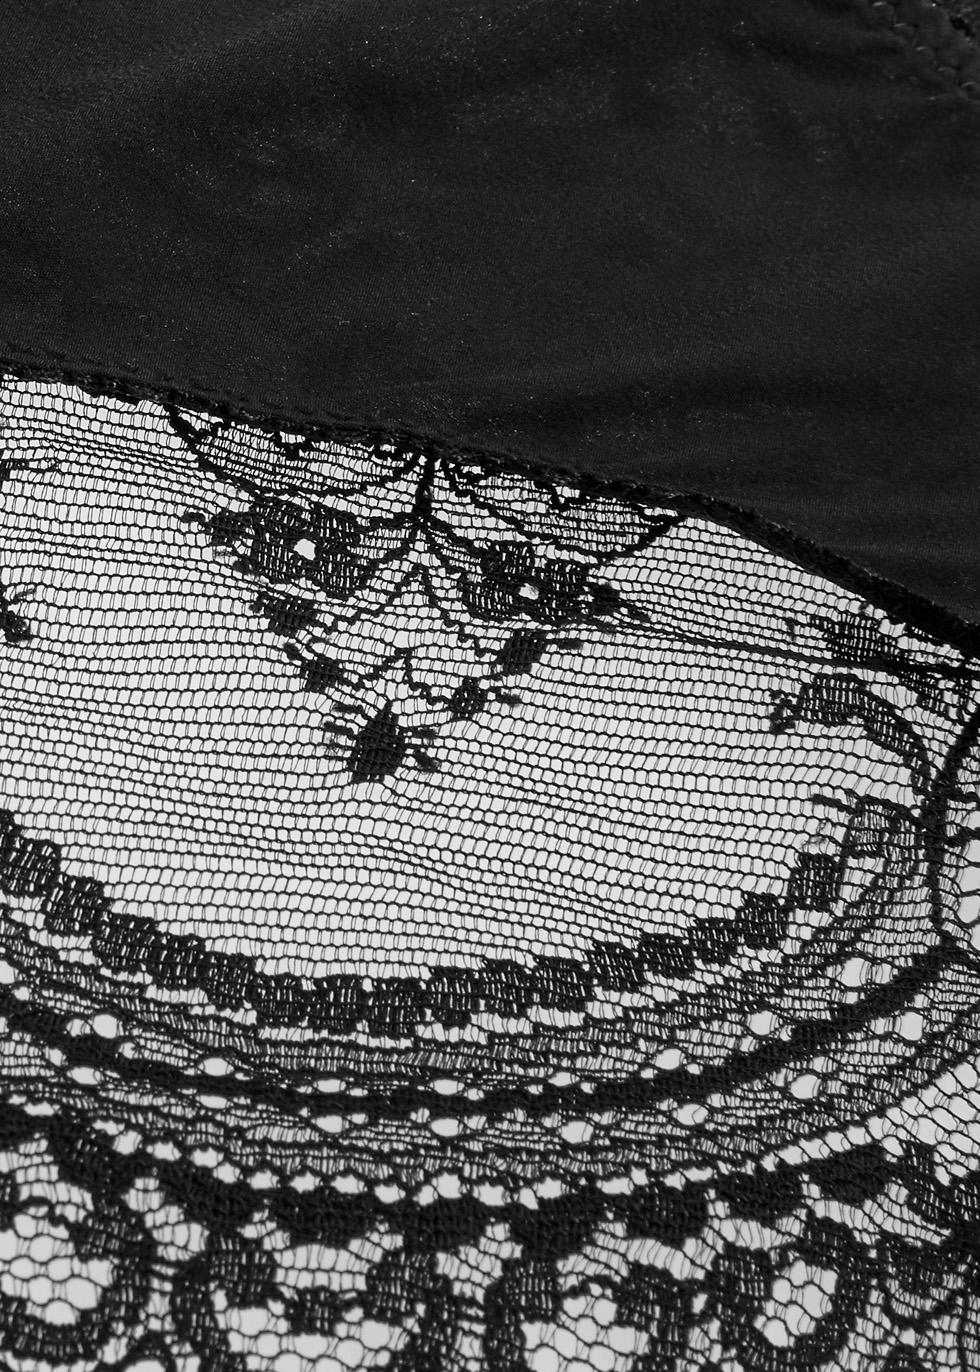 Chrystalle black briefs - Wacoal